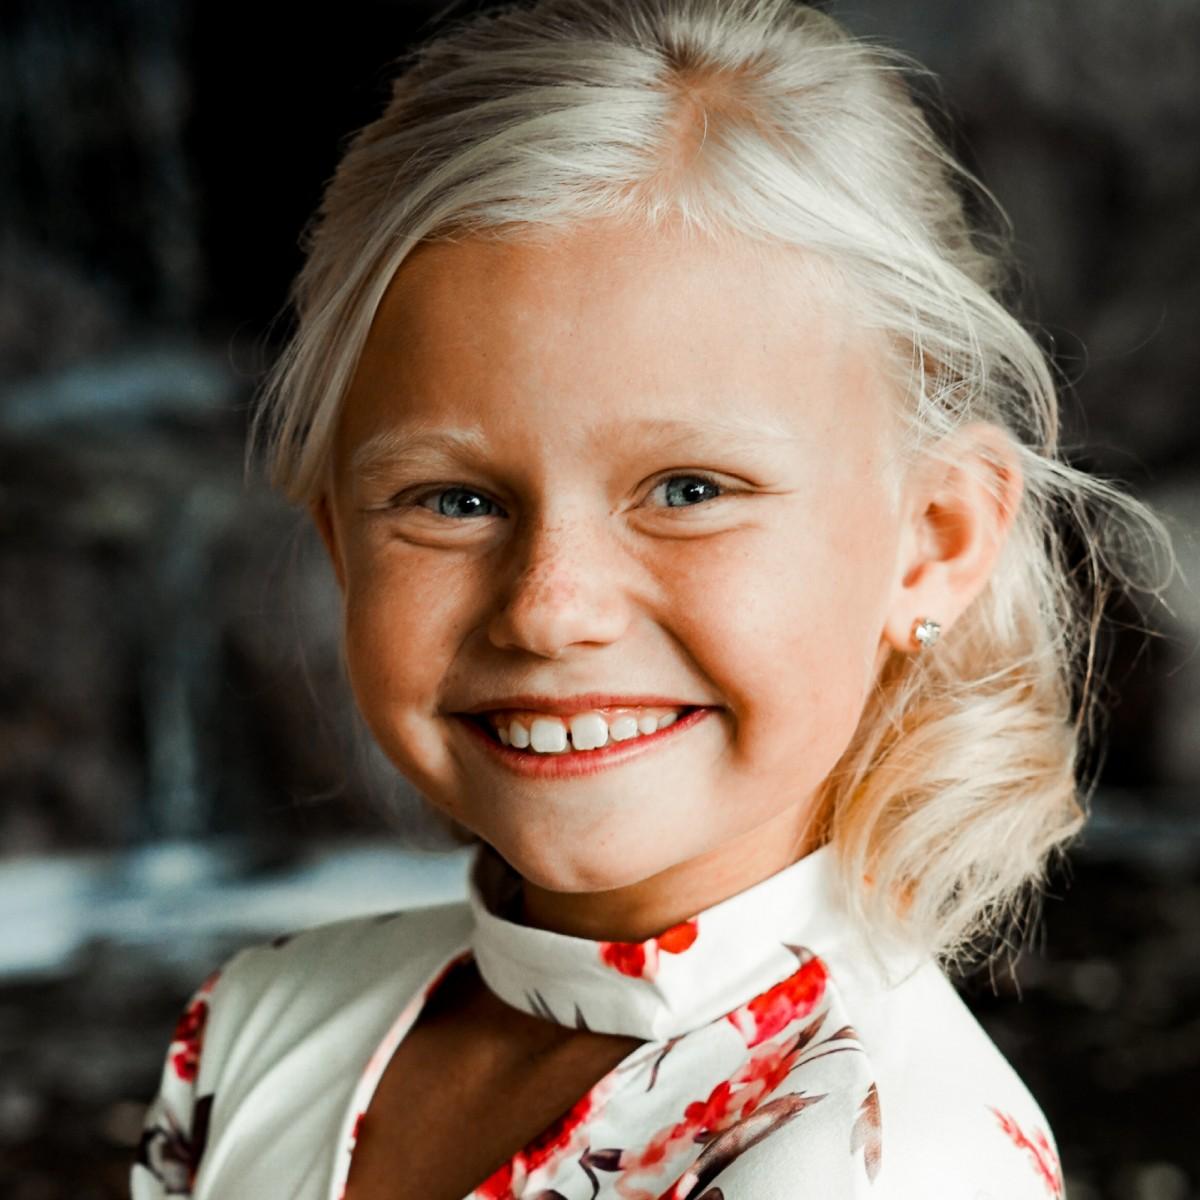 RanDee Ekker